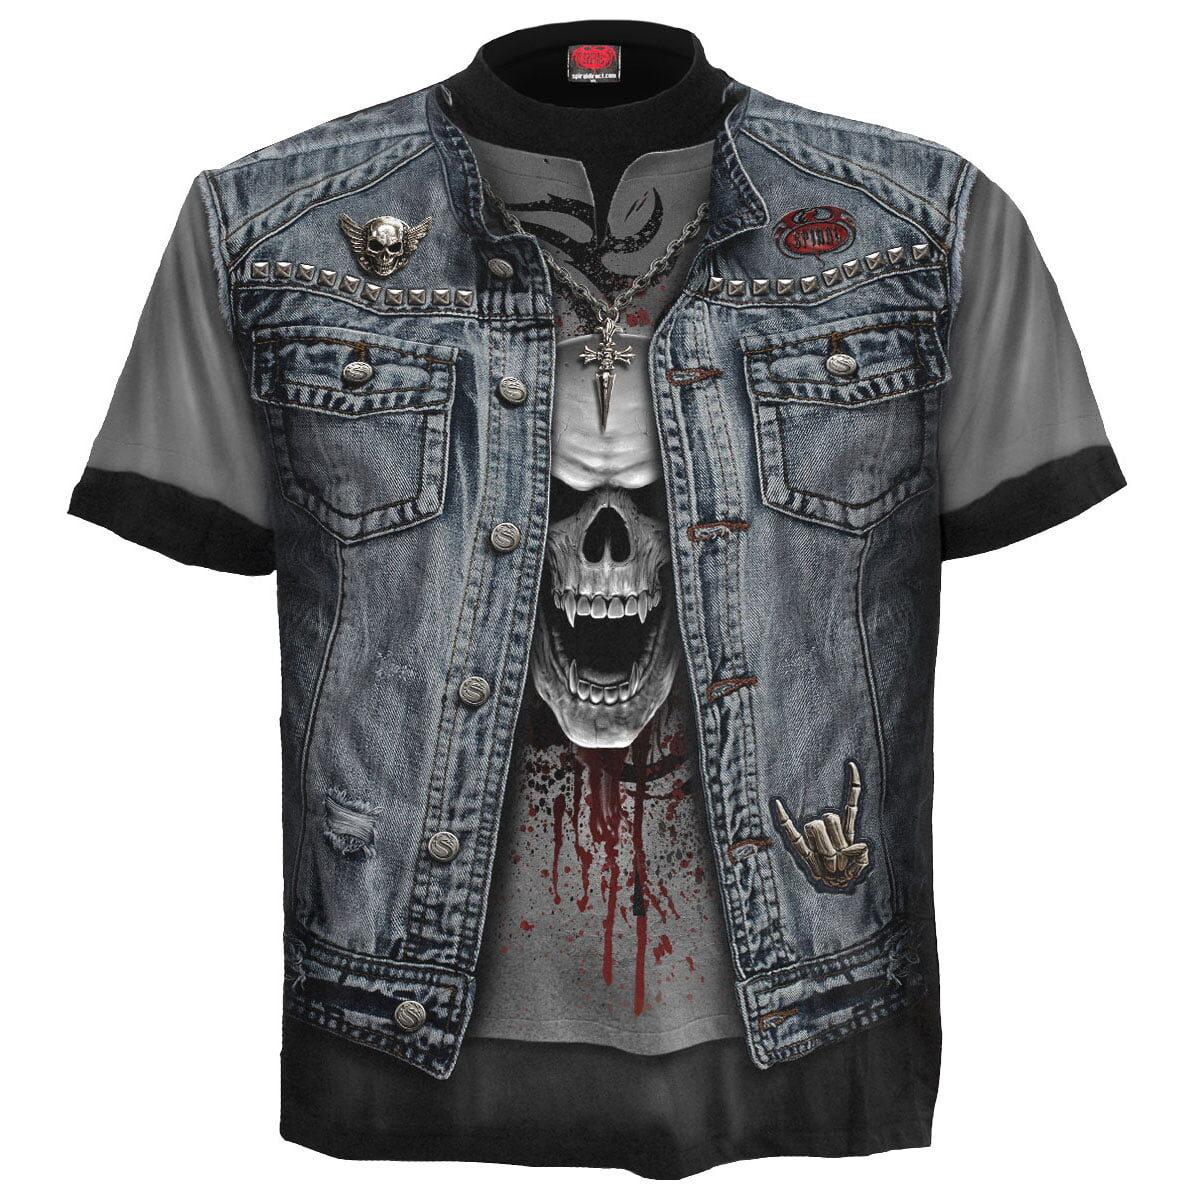 trash metal svart t-skjorte med heltrykk W024M105